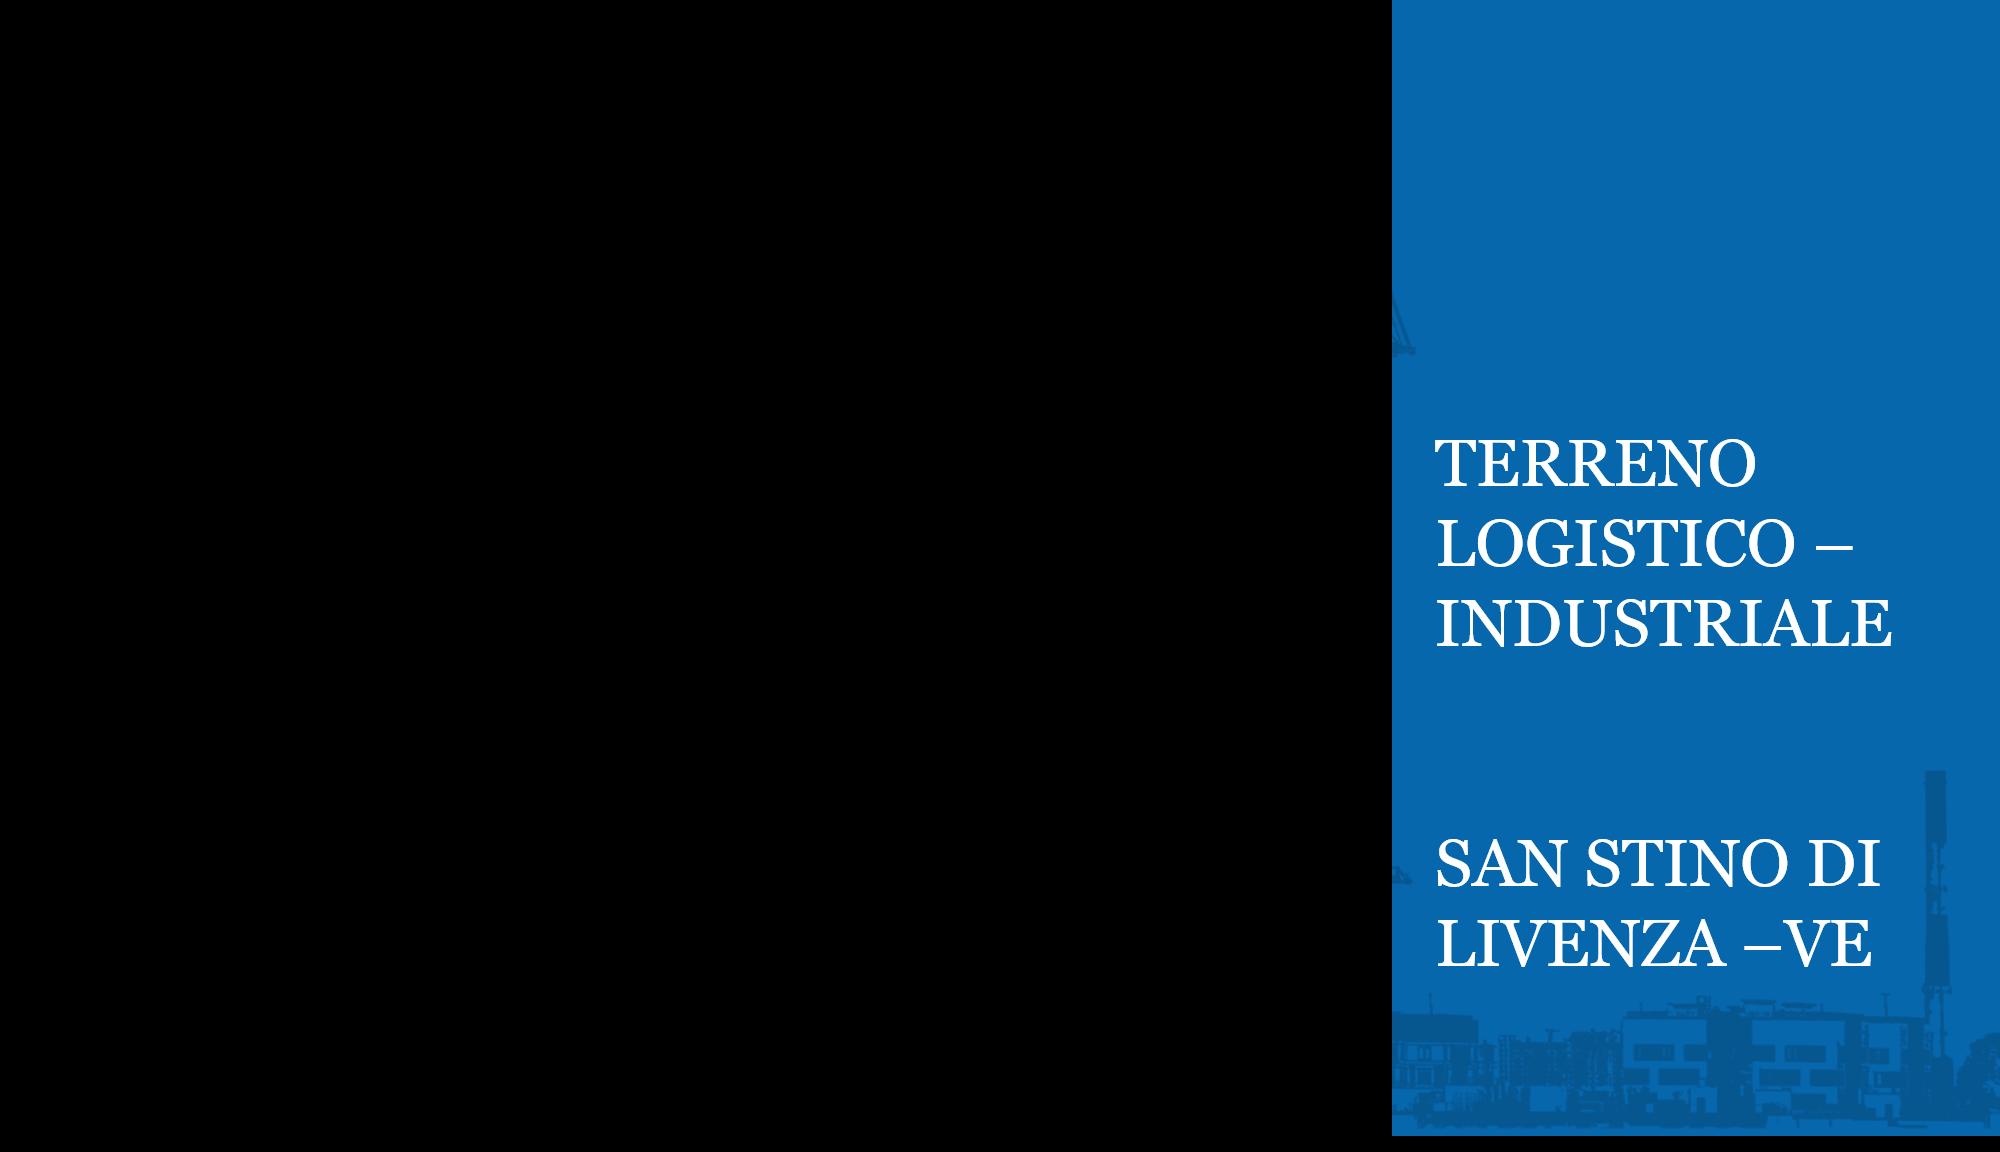 San Stino di Livenza (VE) - Logistica